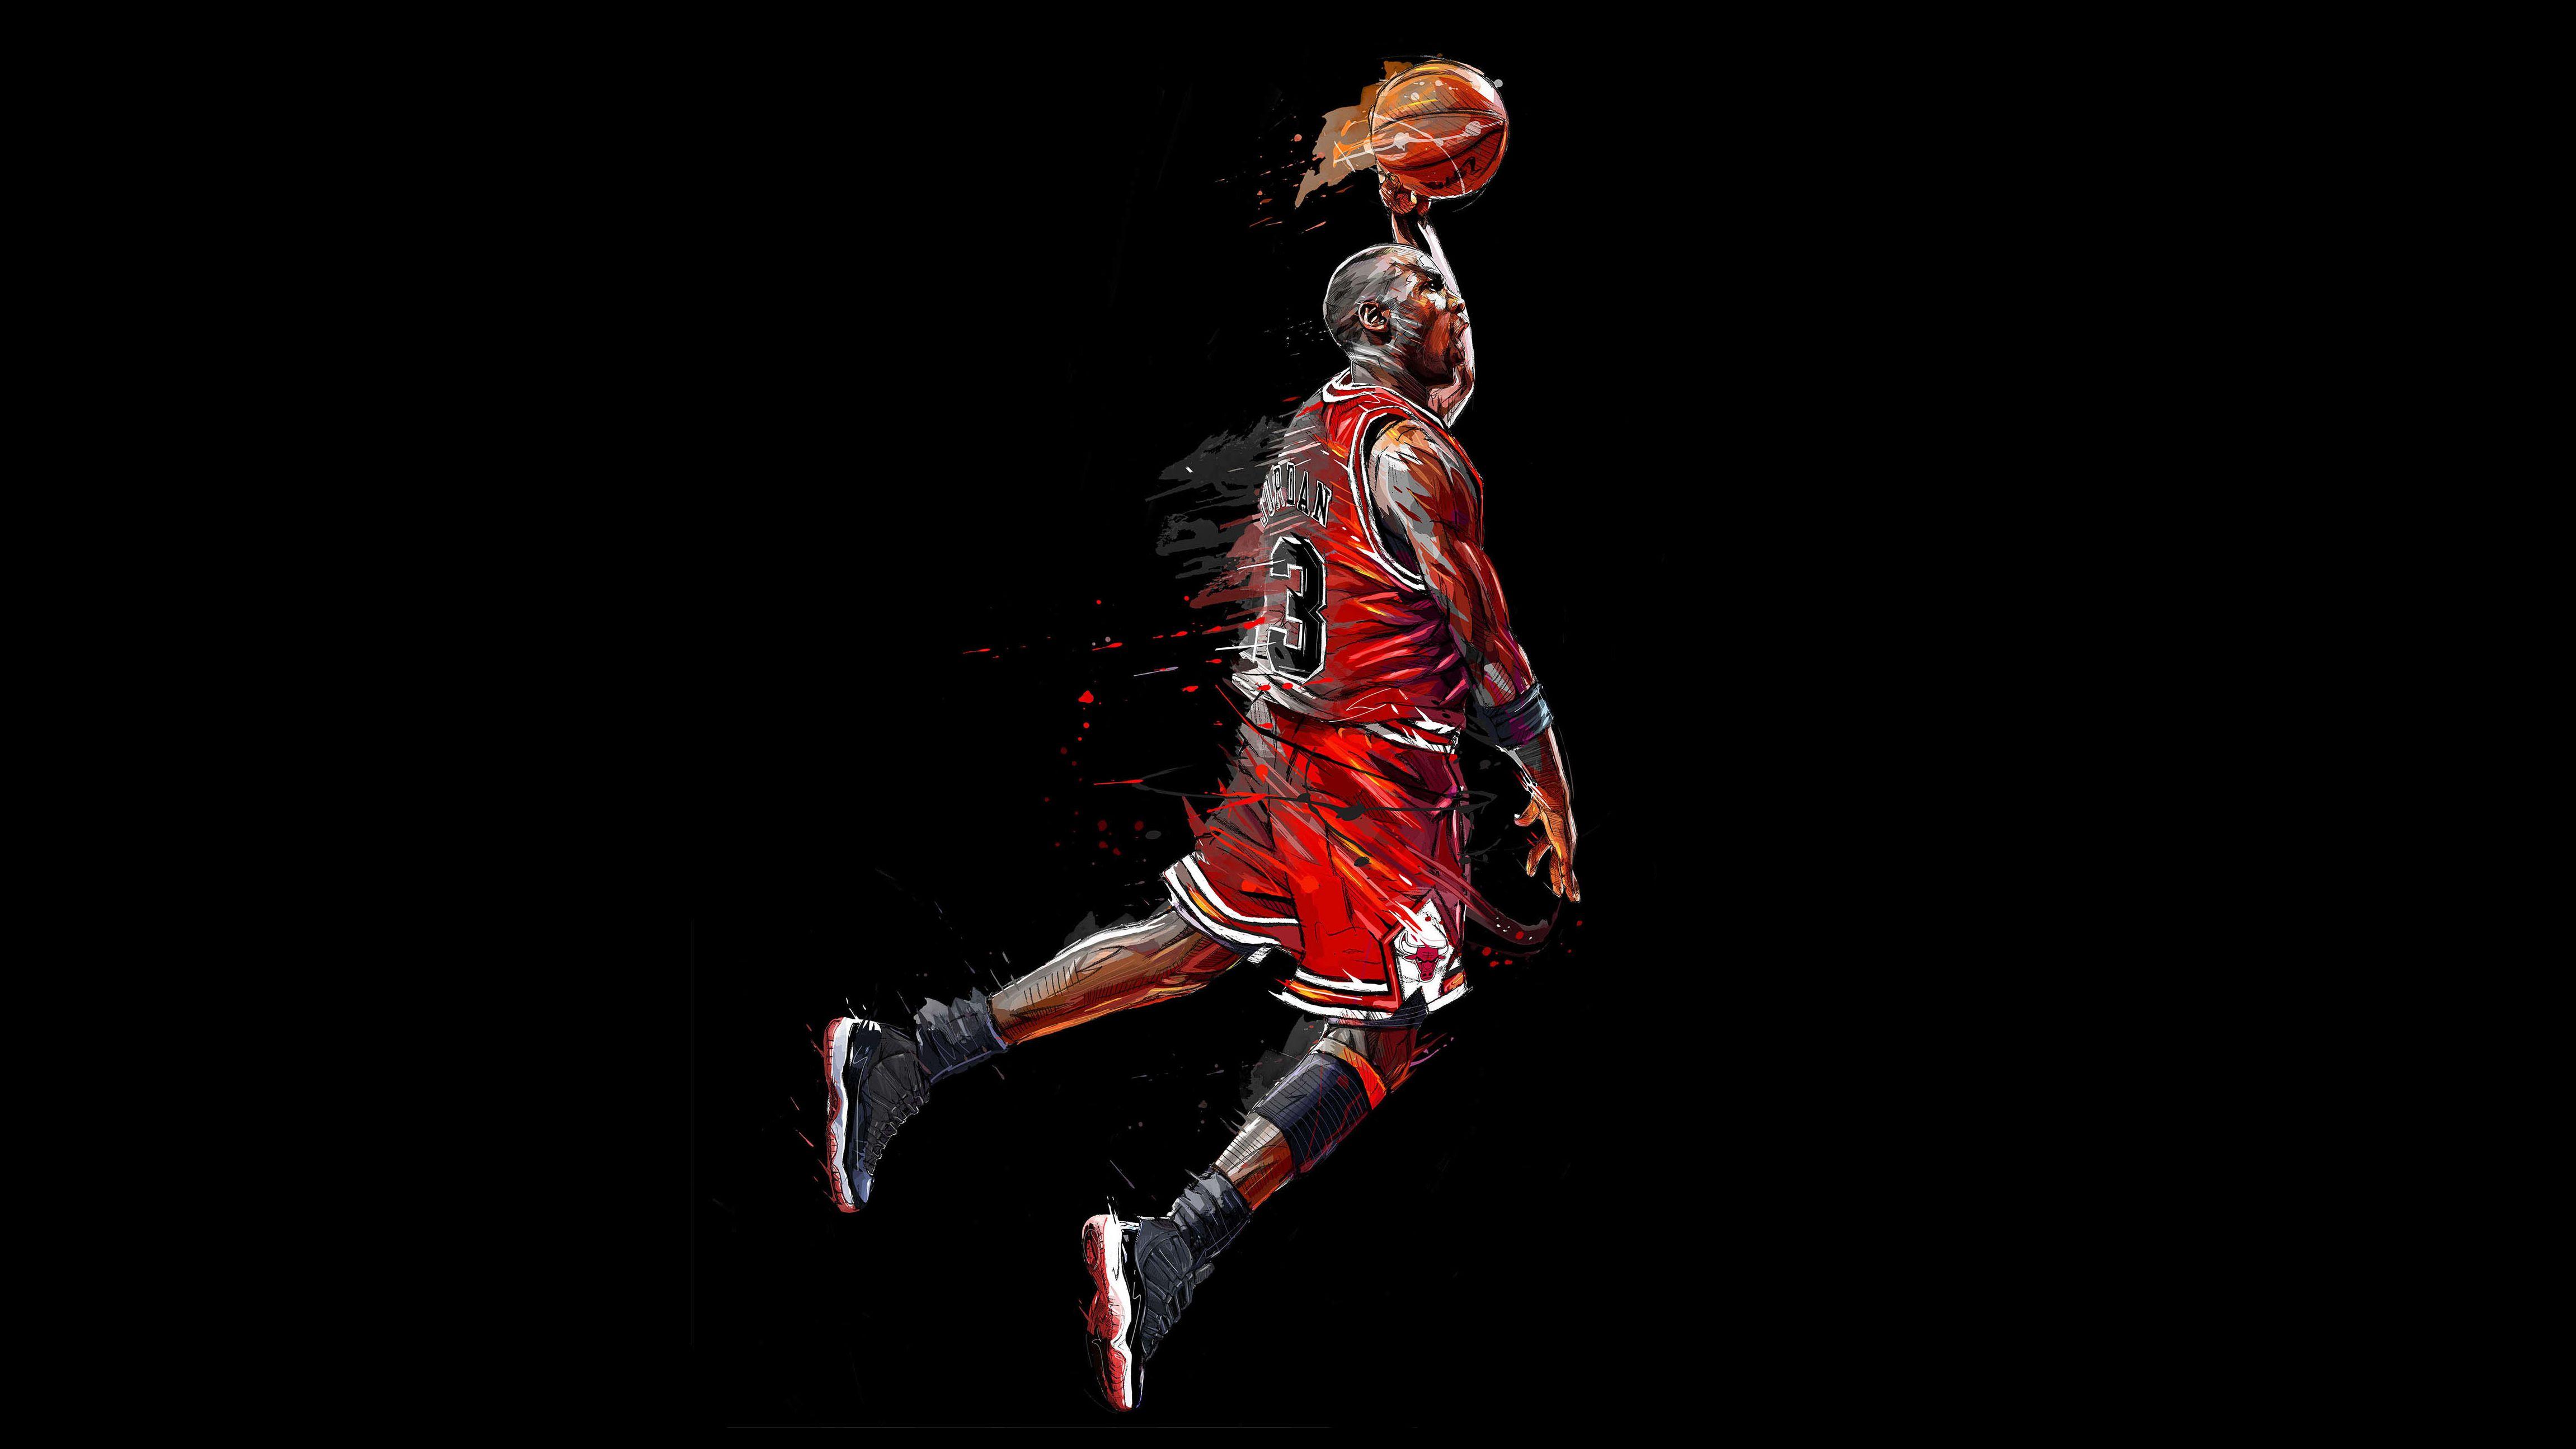 Jordan 4K Wallpapers   Top Jordan 4K Backgrounds 4604x2590